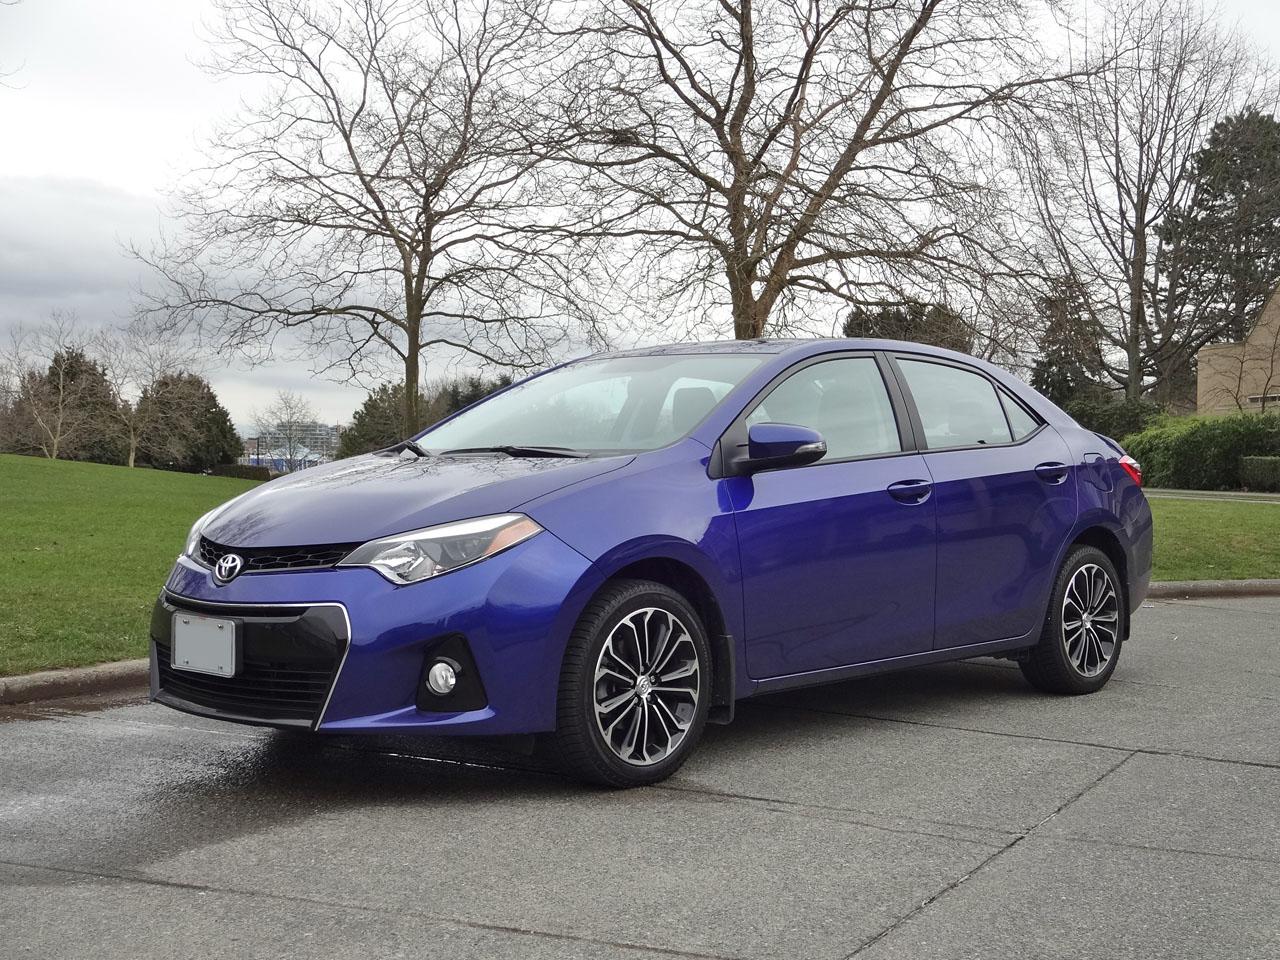 Toyota Yaris Prices In Uae Specs Reviews For Dubai Abu